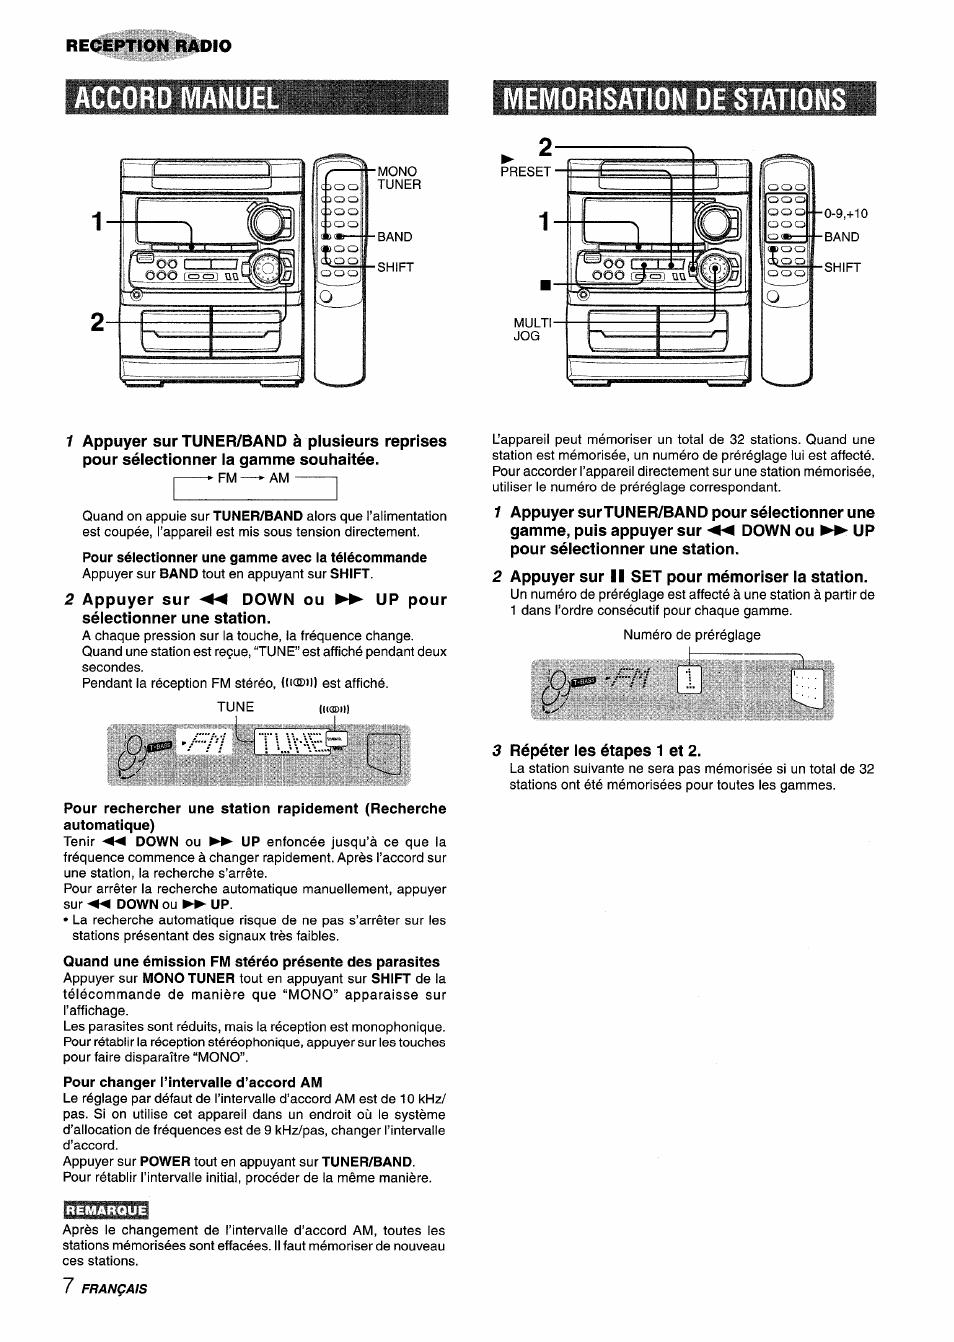 Aiwa cx-na303 compact disc stereo 3cd dual cassette tape receiver.